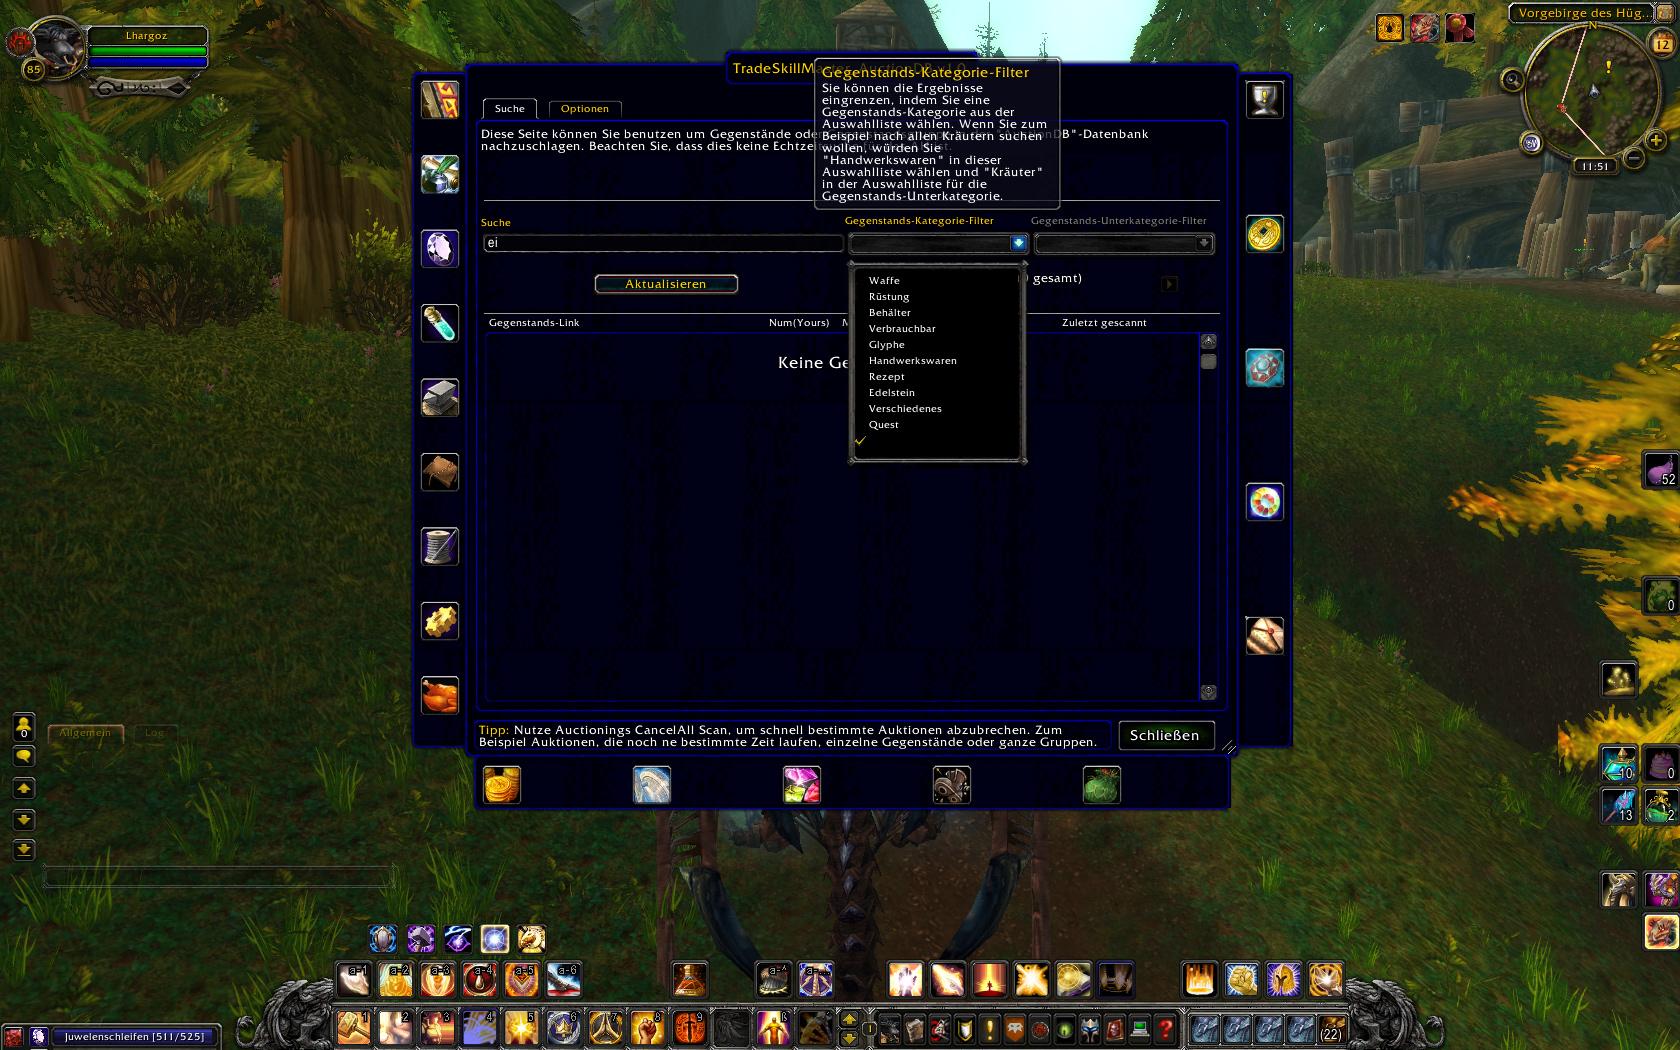 TradeSkillMaster_AuctionDB